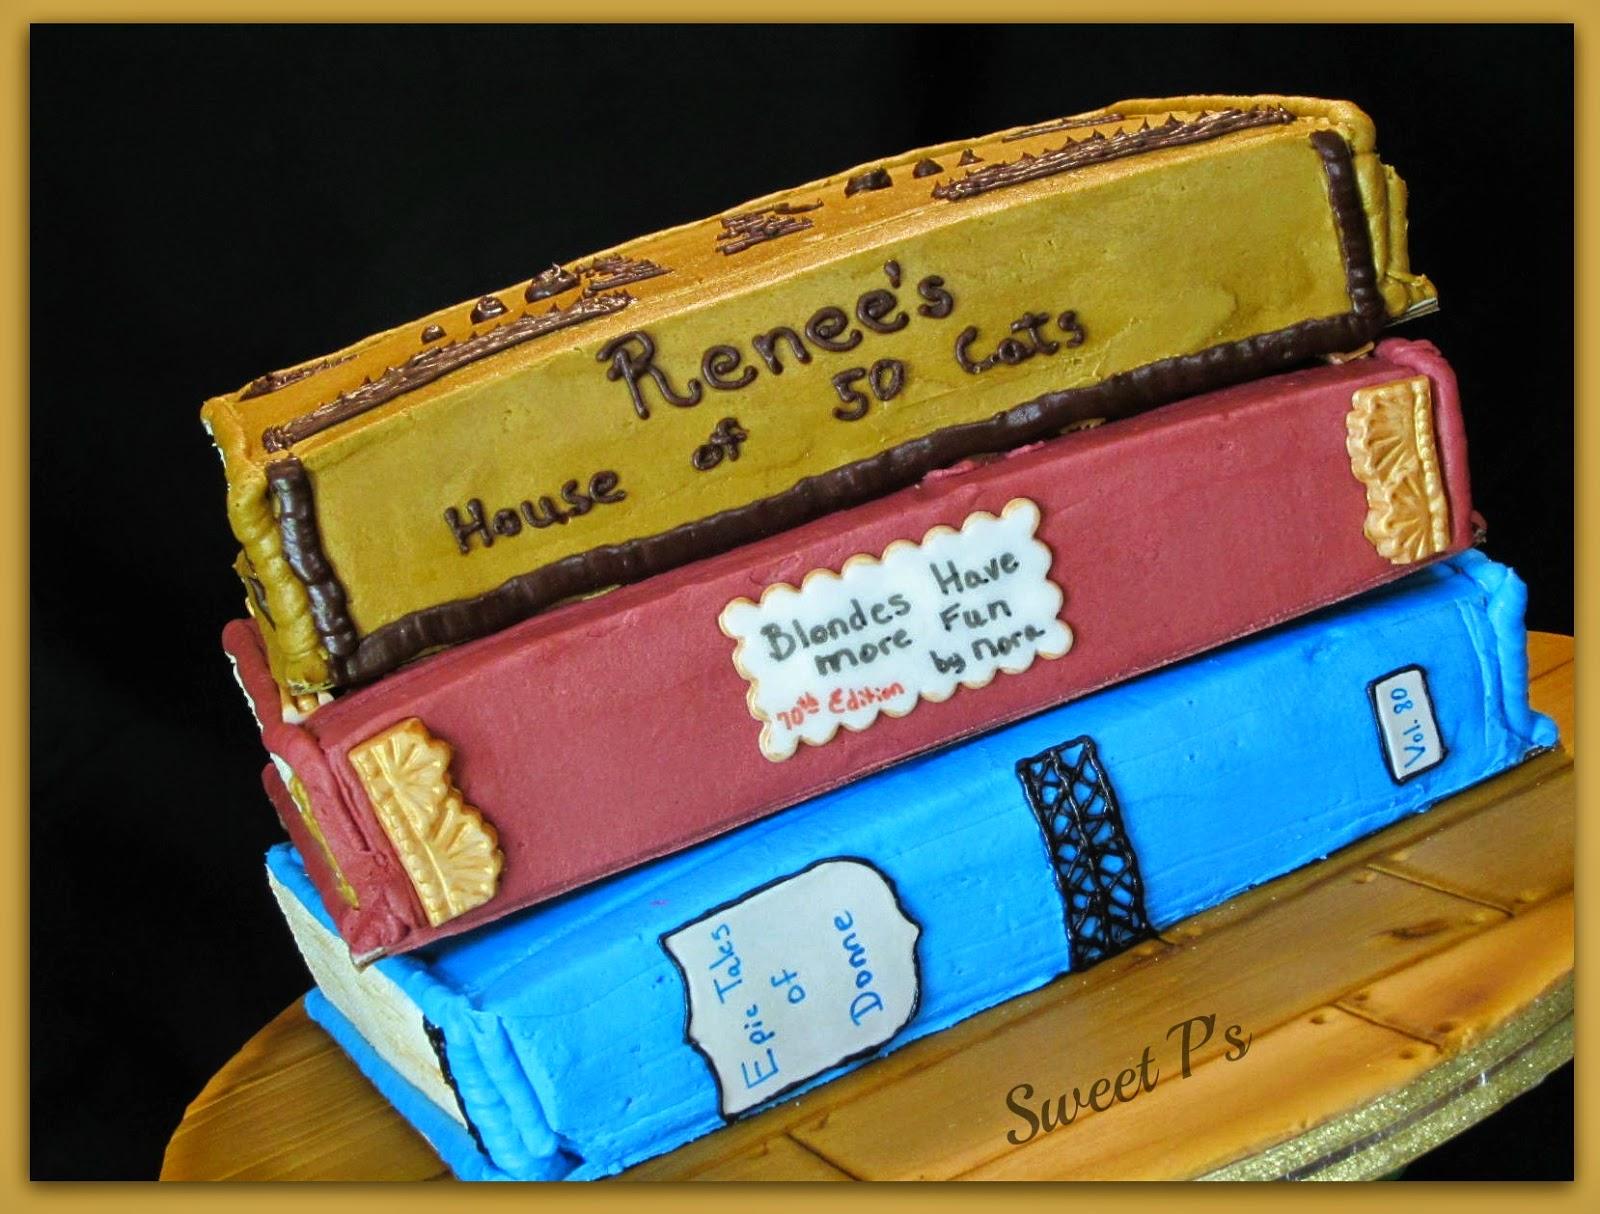 MS book cake